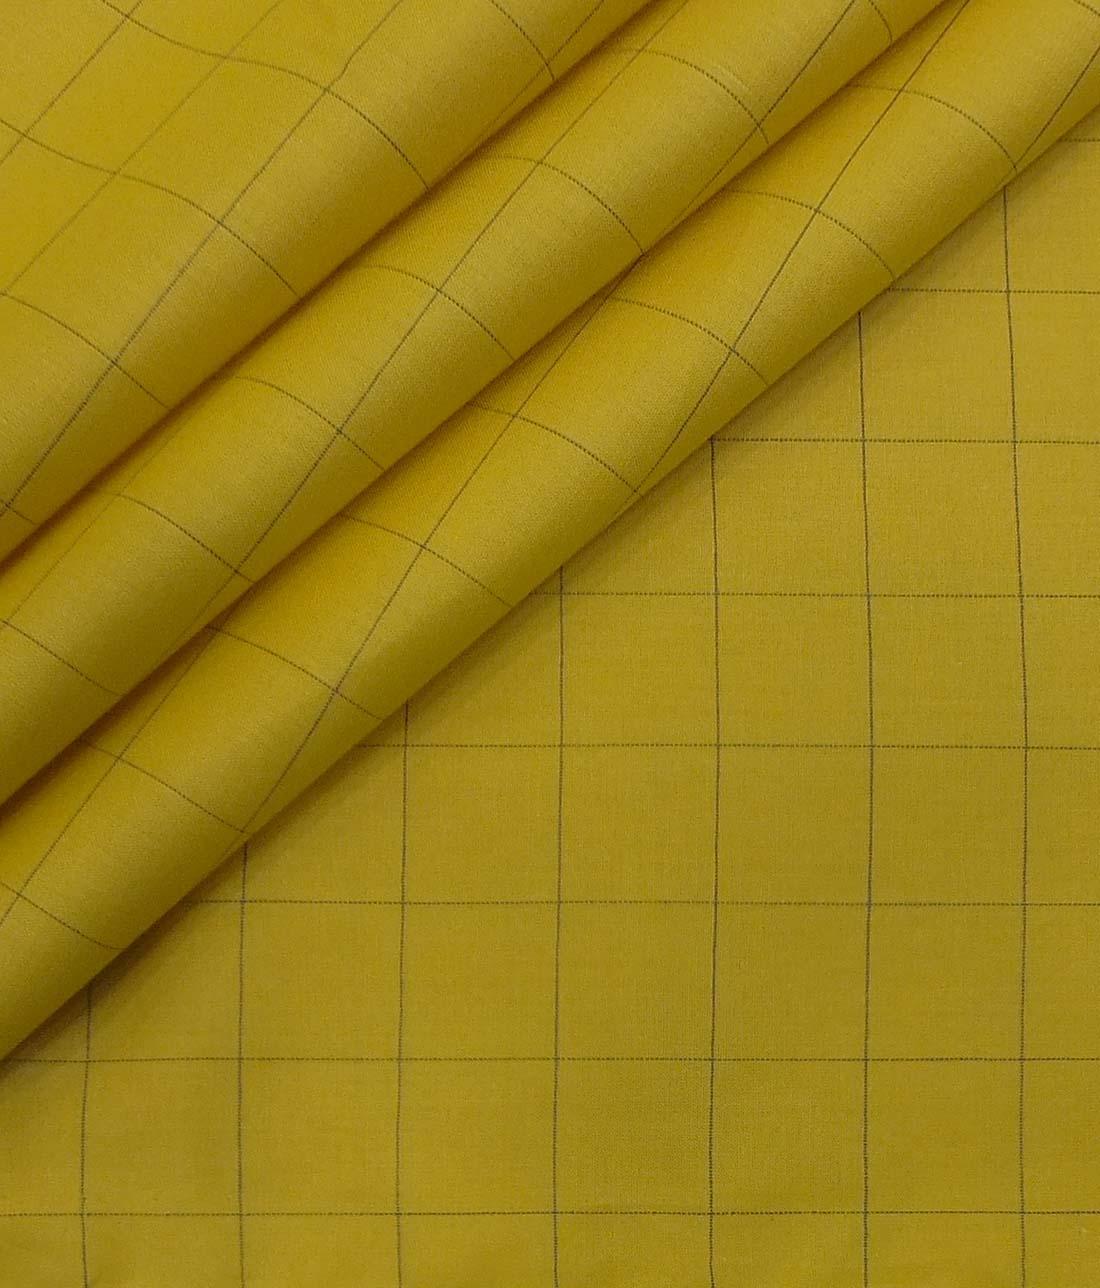 6f3454740f7 Monza Men's Yellow & Blue Broad Check Cotton Shirt Fabric